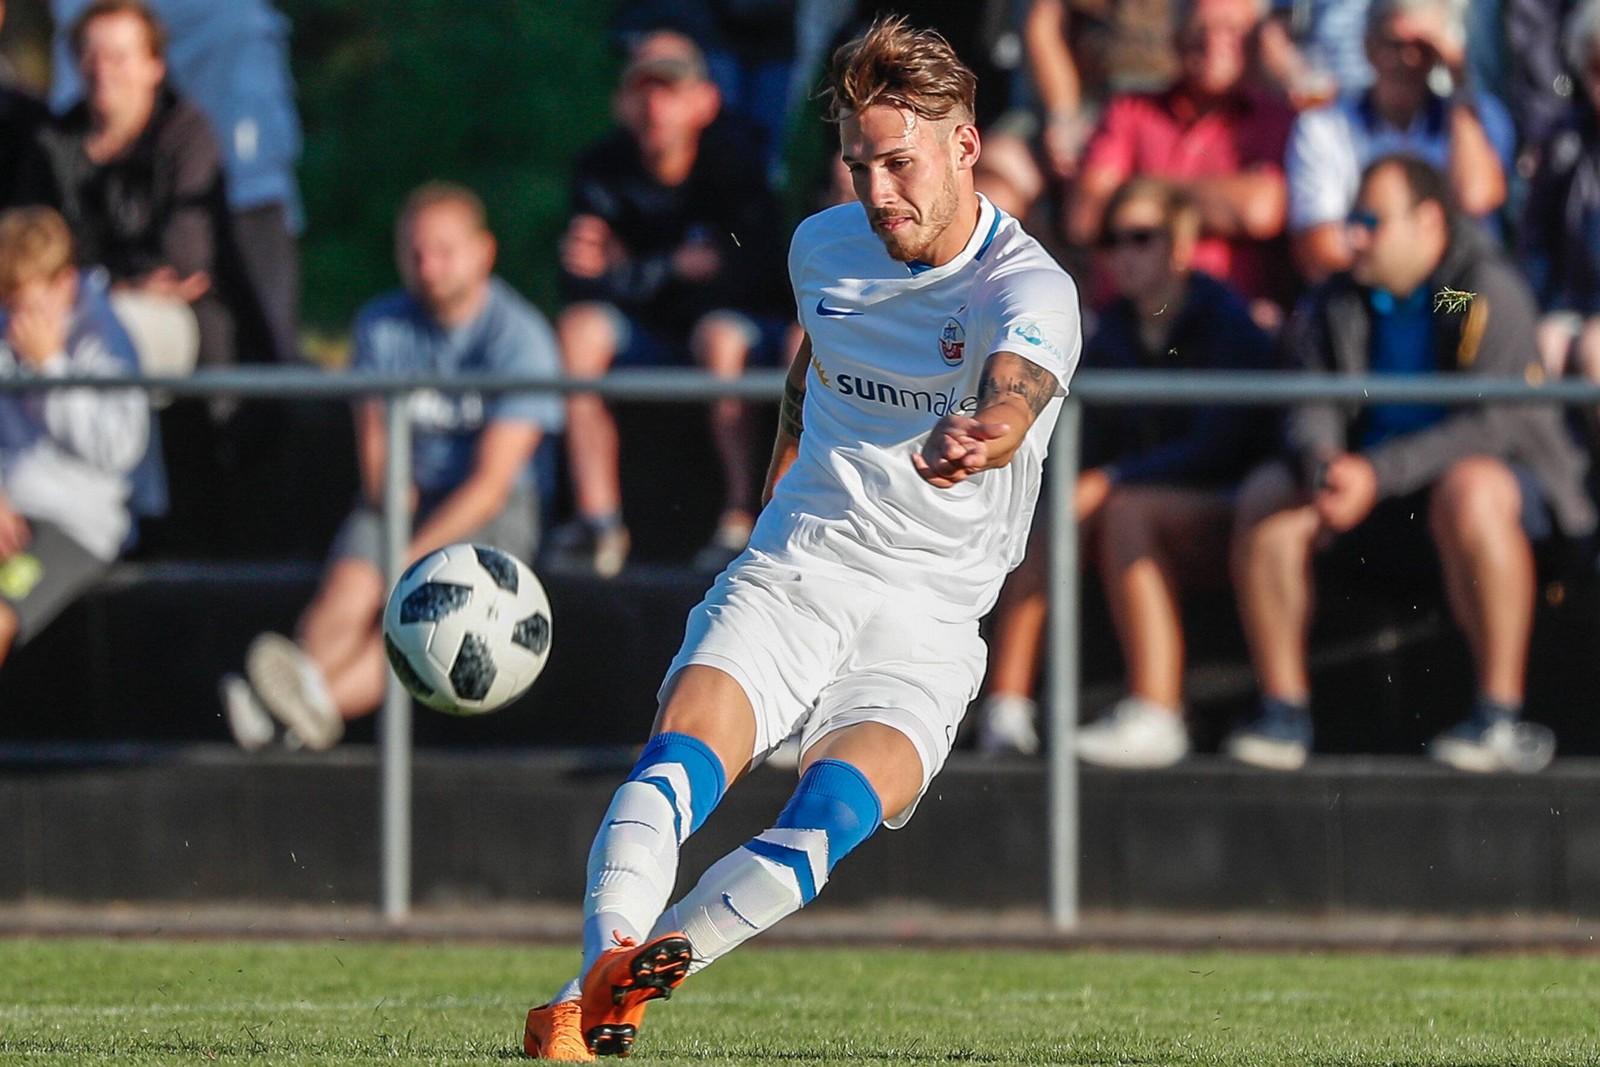 Jonas Hildebrandt vom FC Hansa Rostock